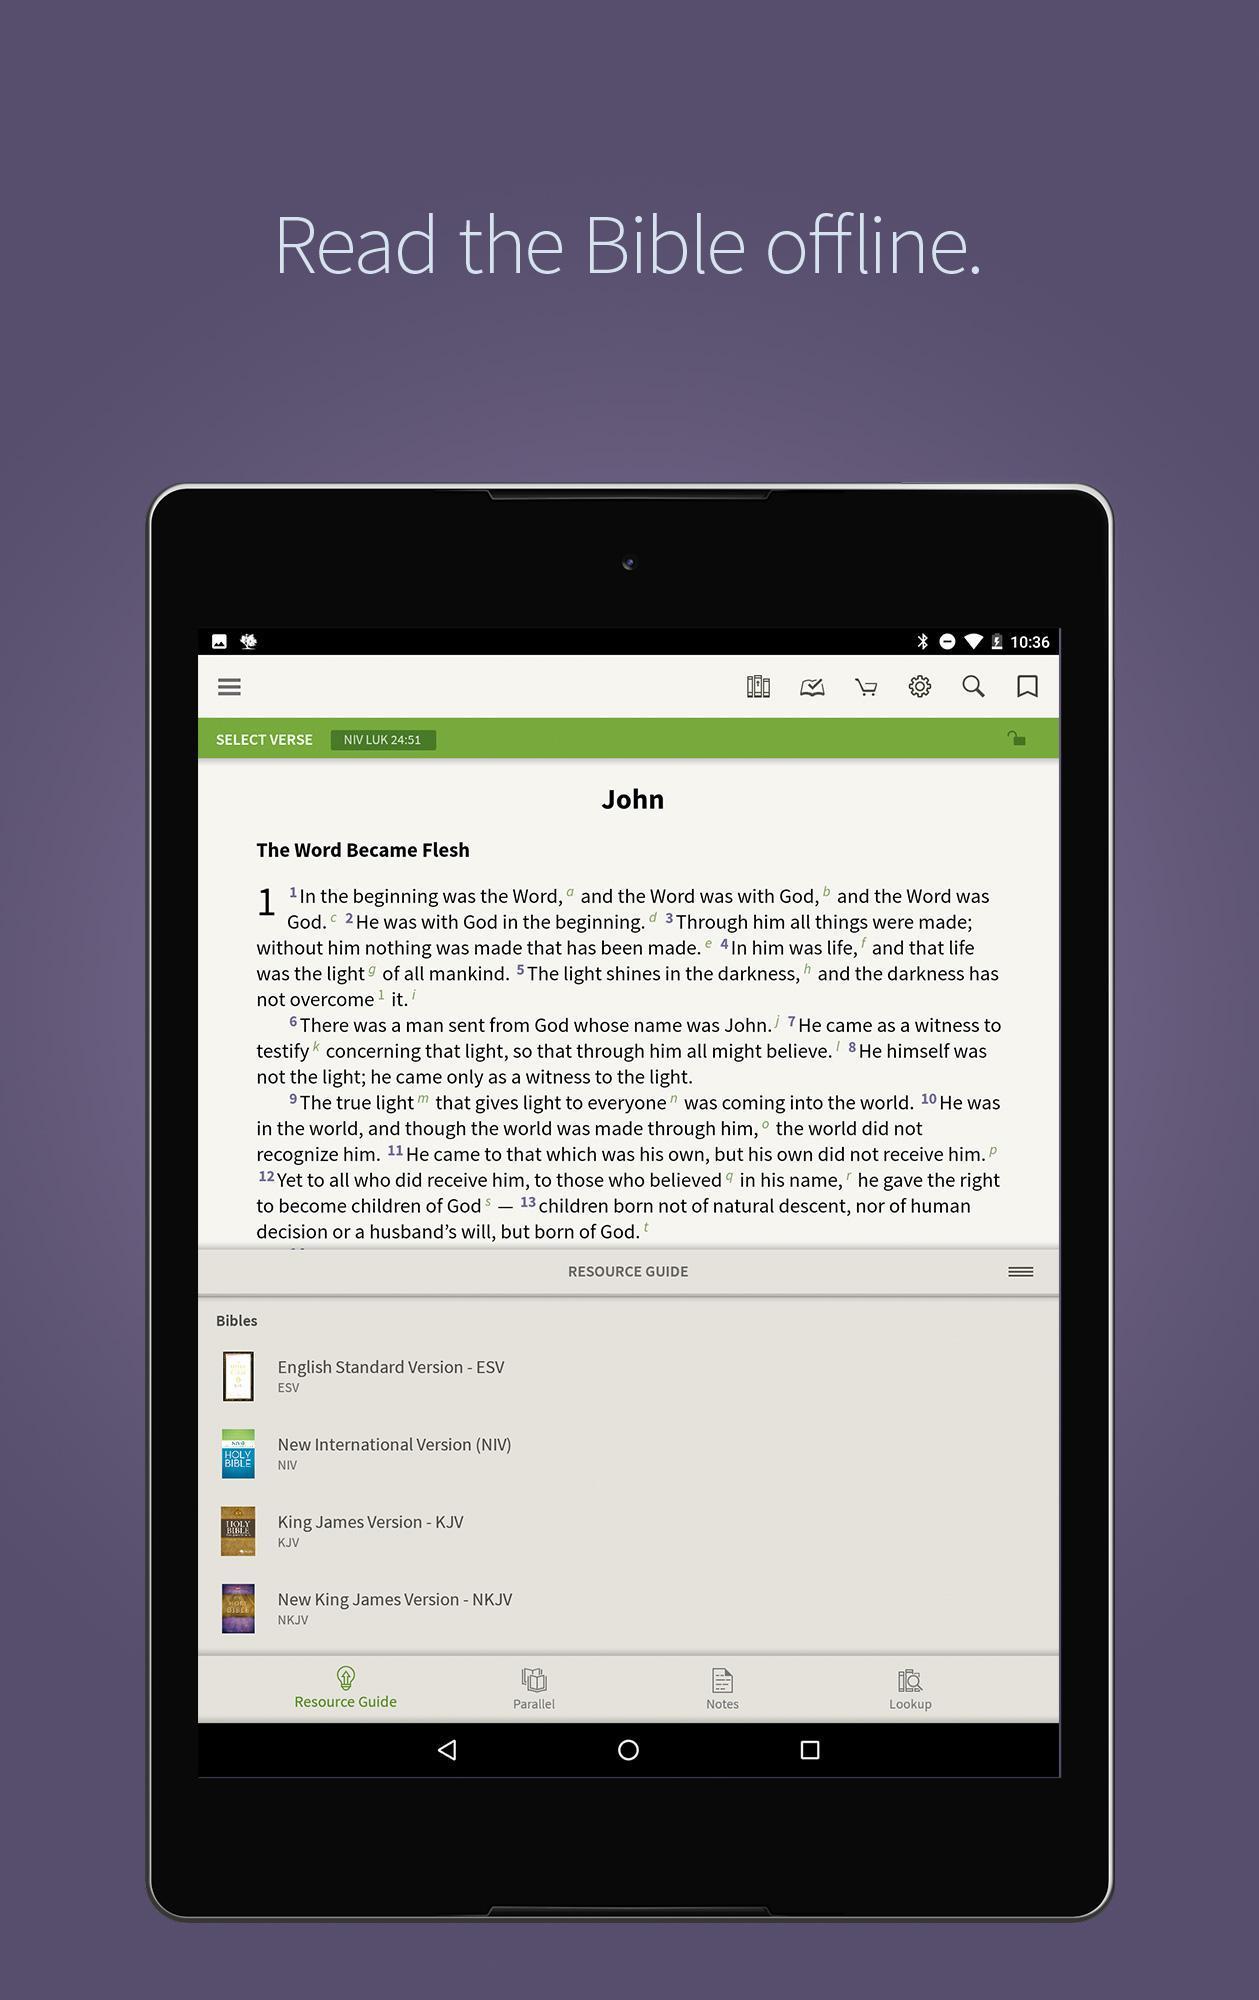 Bible App by Olive Tree 7.5.4.0.5664 Screenshot 9